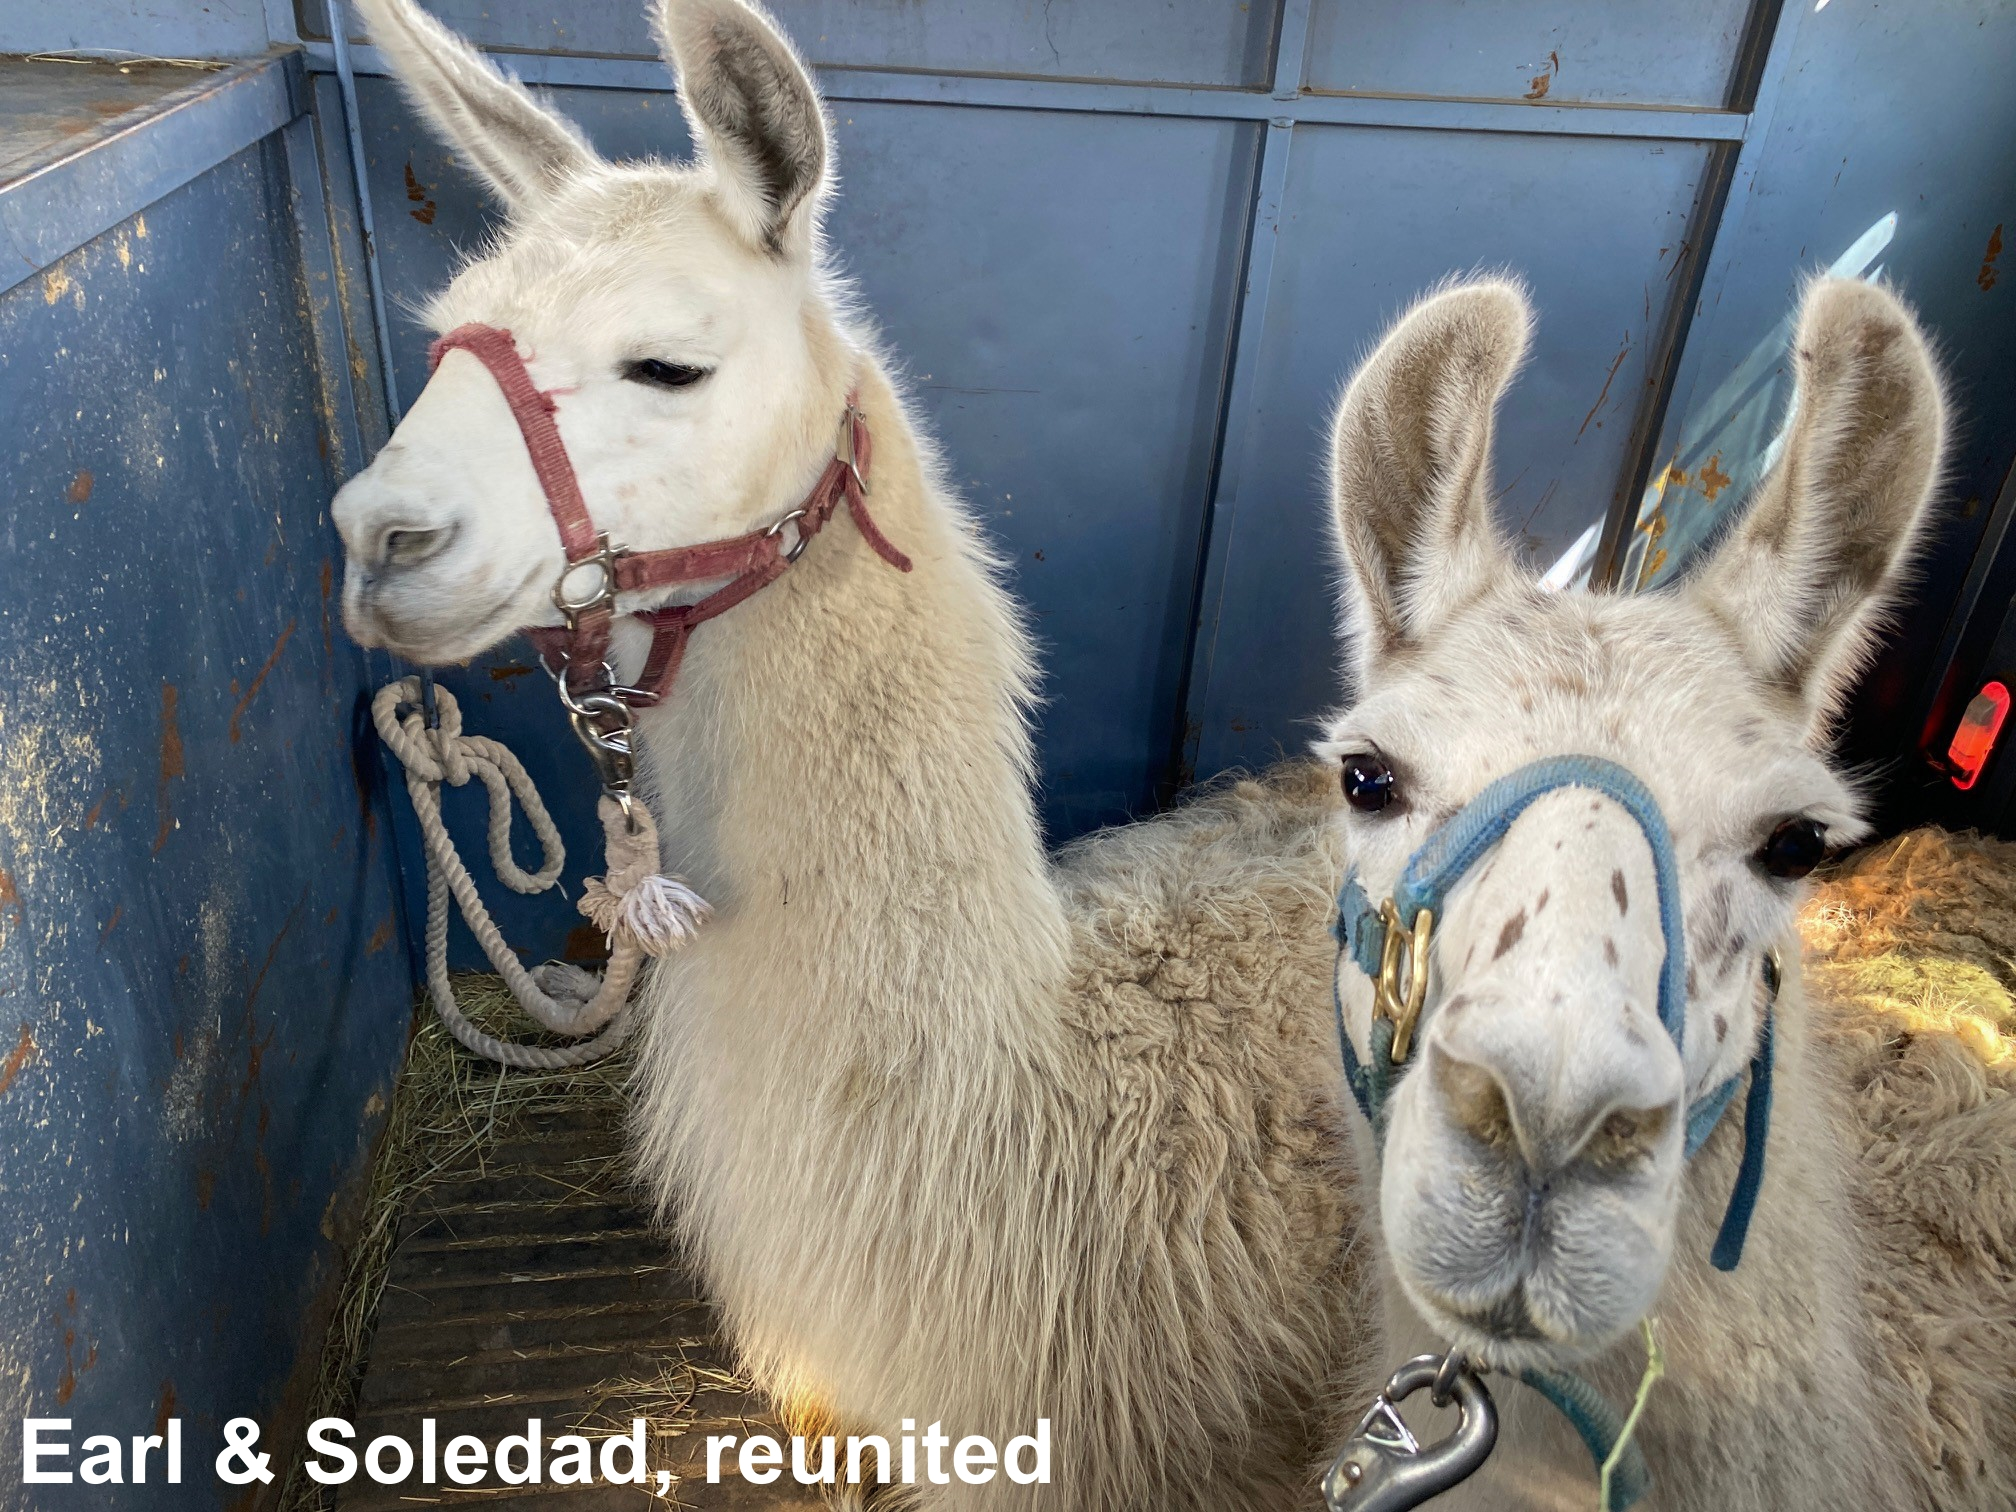 The Great Llama Rescue